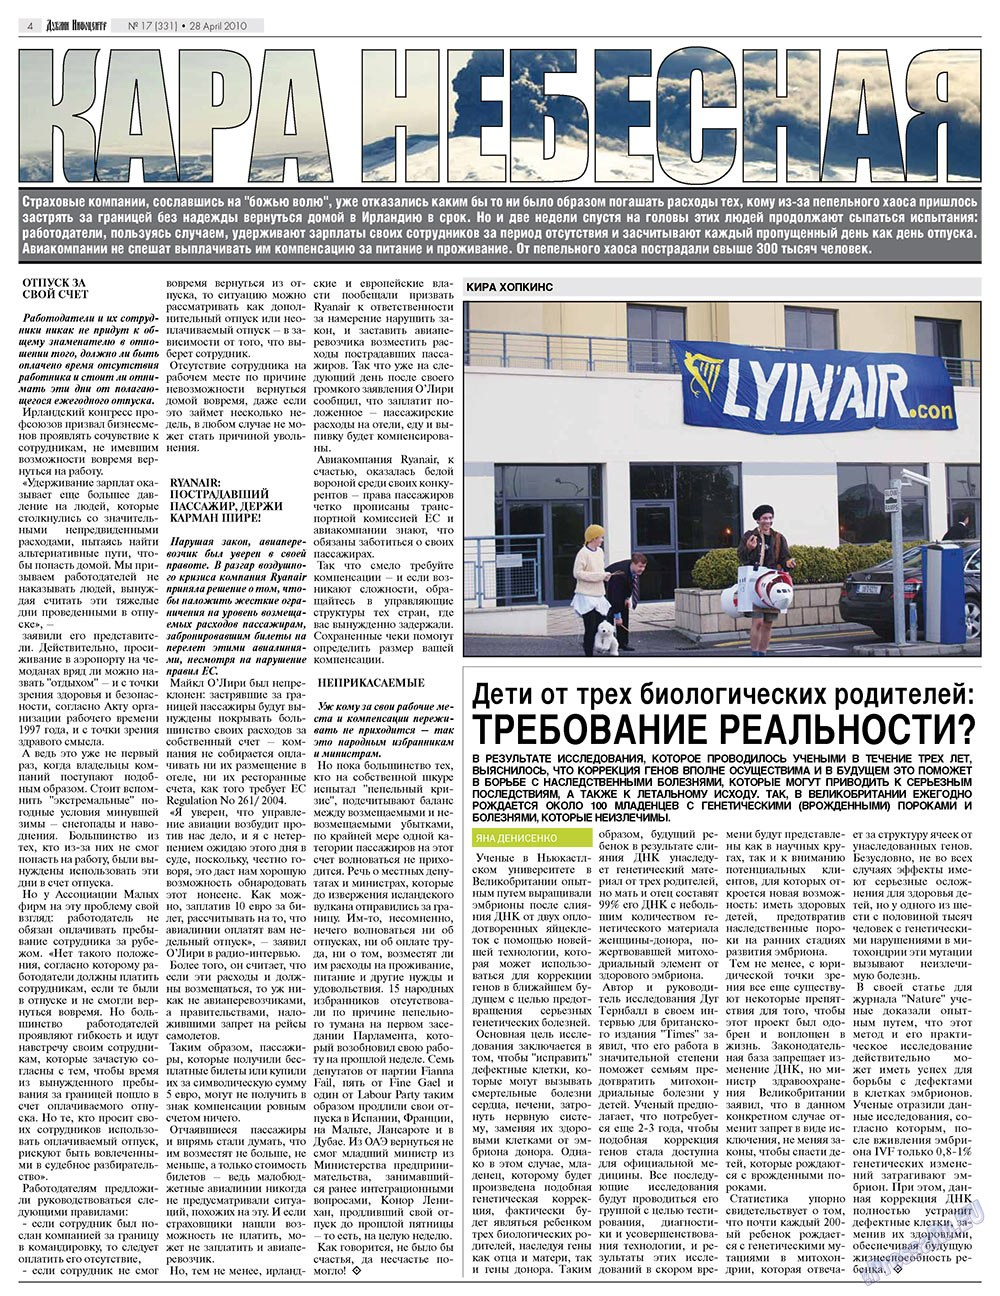 Дублин инфоцентр (газета). 2010 год, номер 17, стр. 4